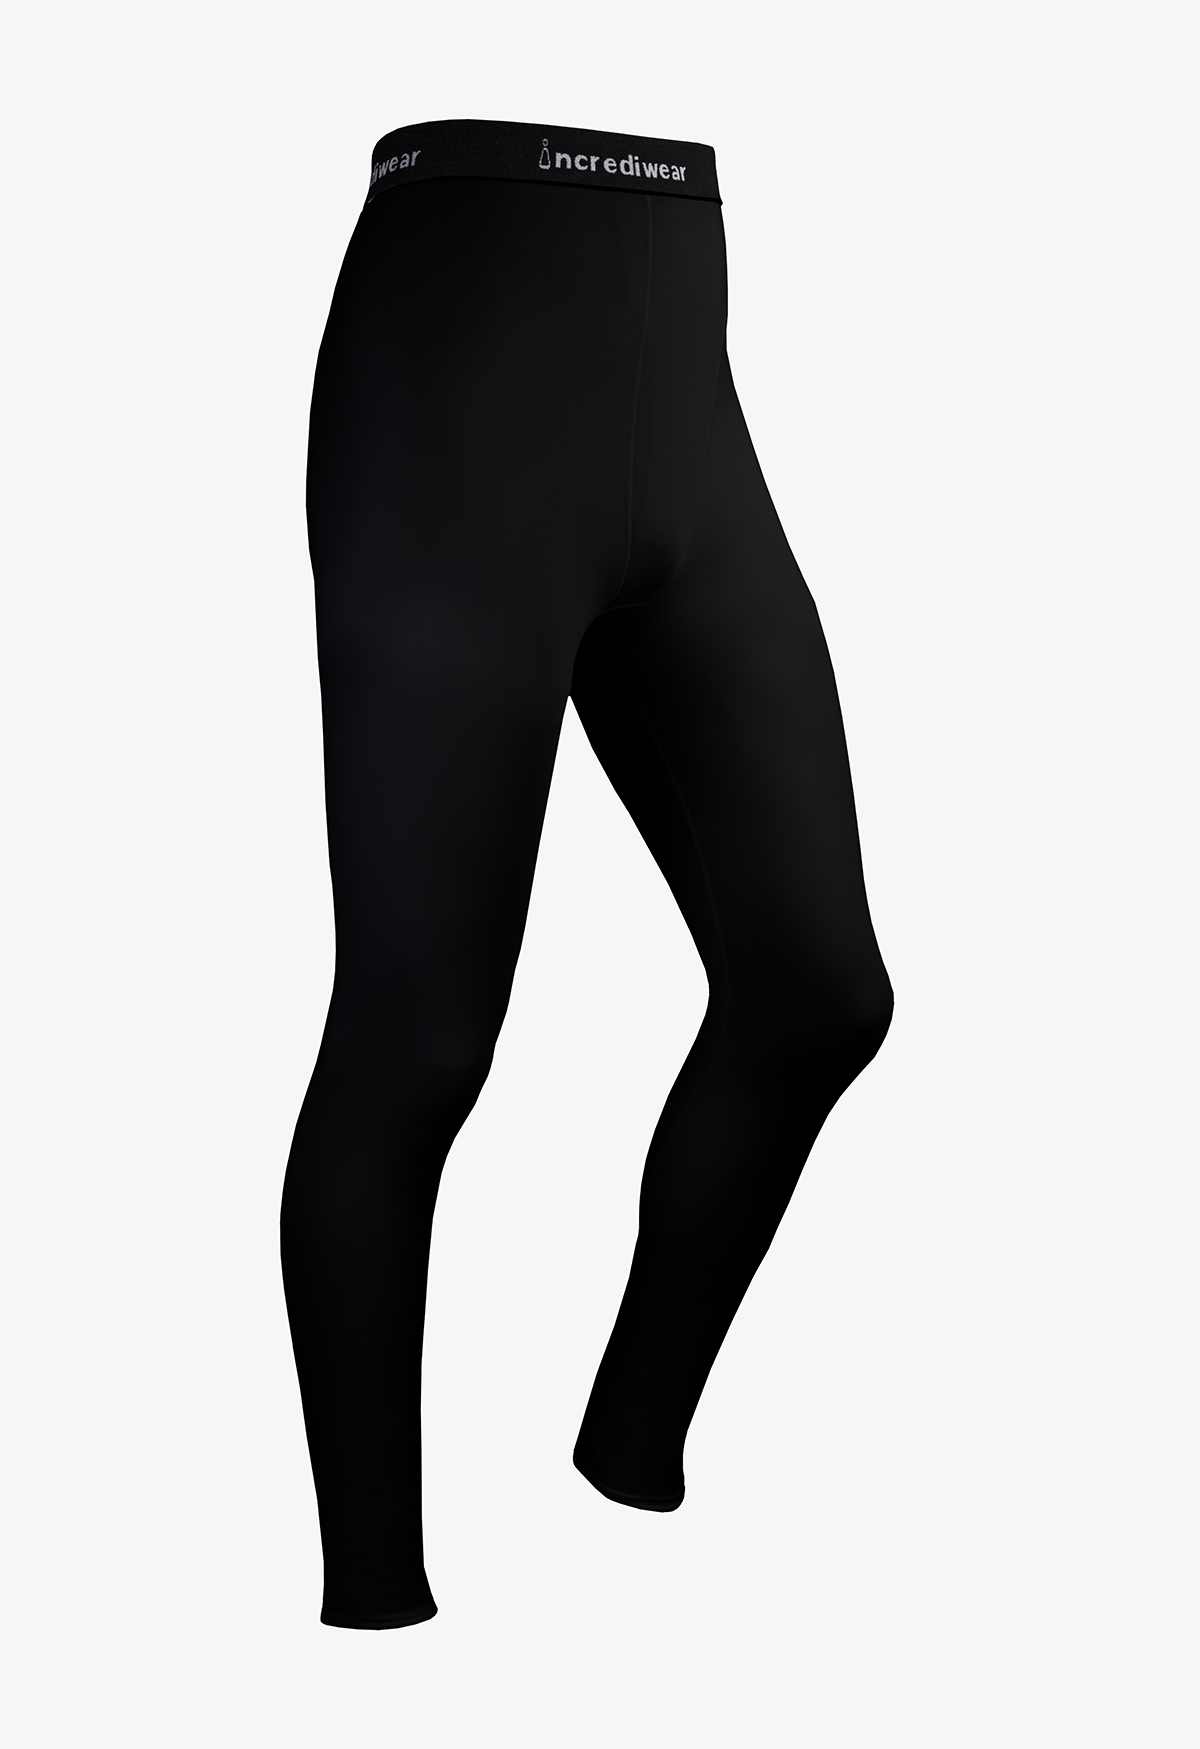 Mens Performance Pants - Black - Left